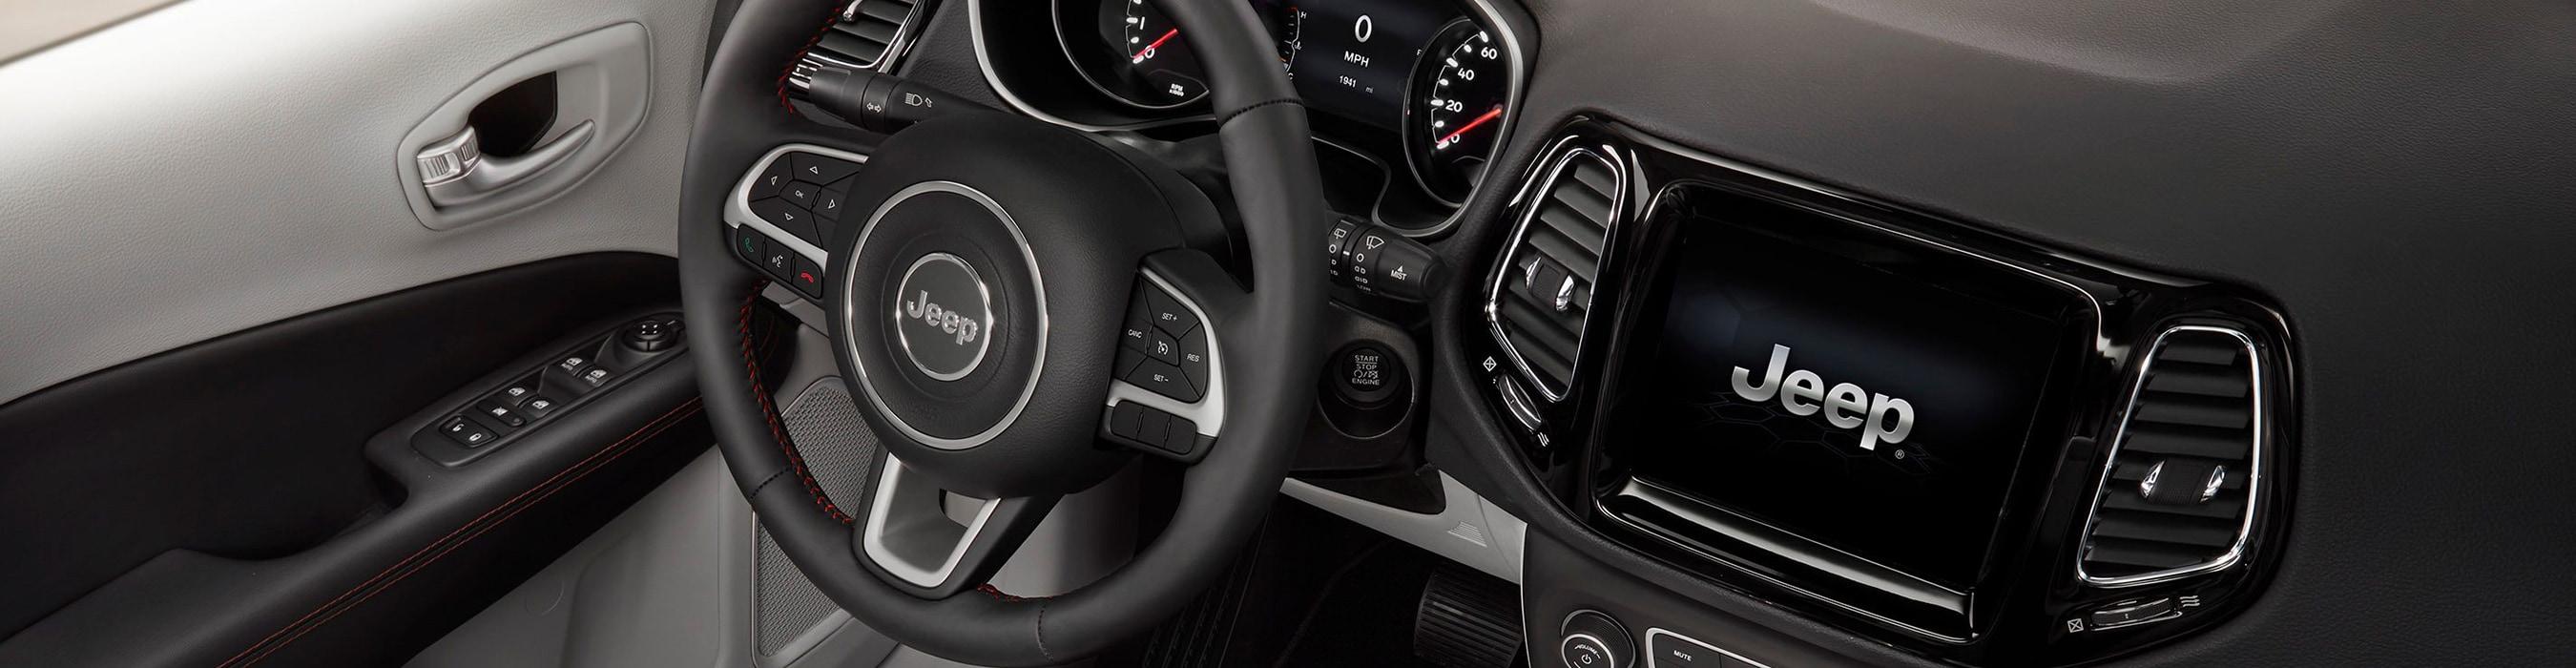 Huge savings on 2019 Jeep Compass | 400 Chrysler Dodge Jeep Ram